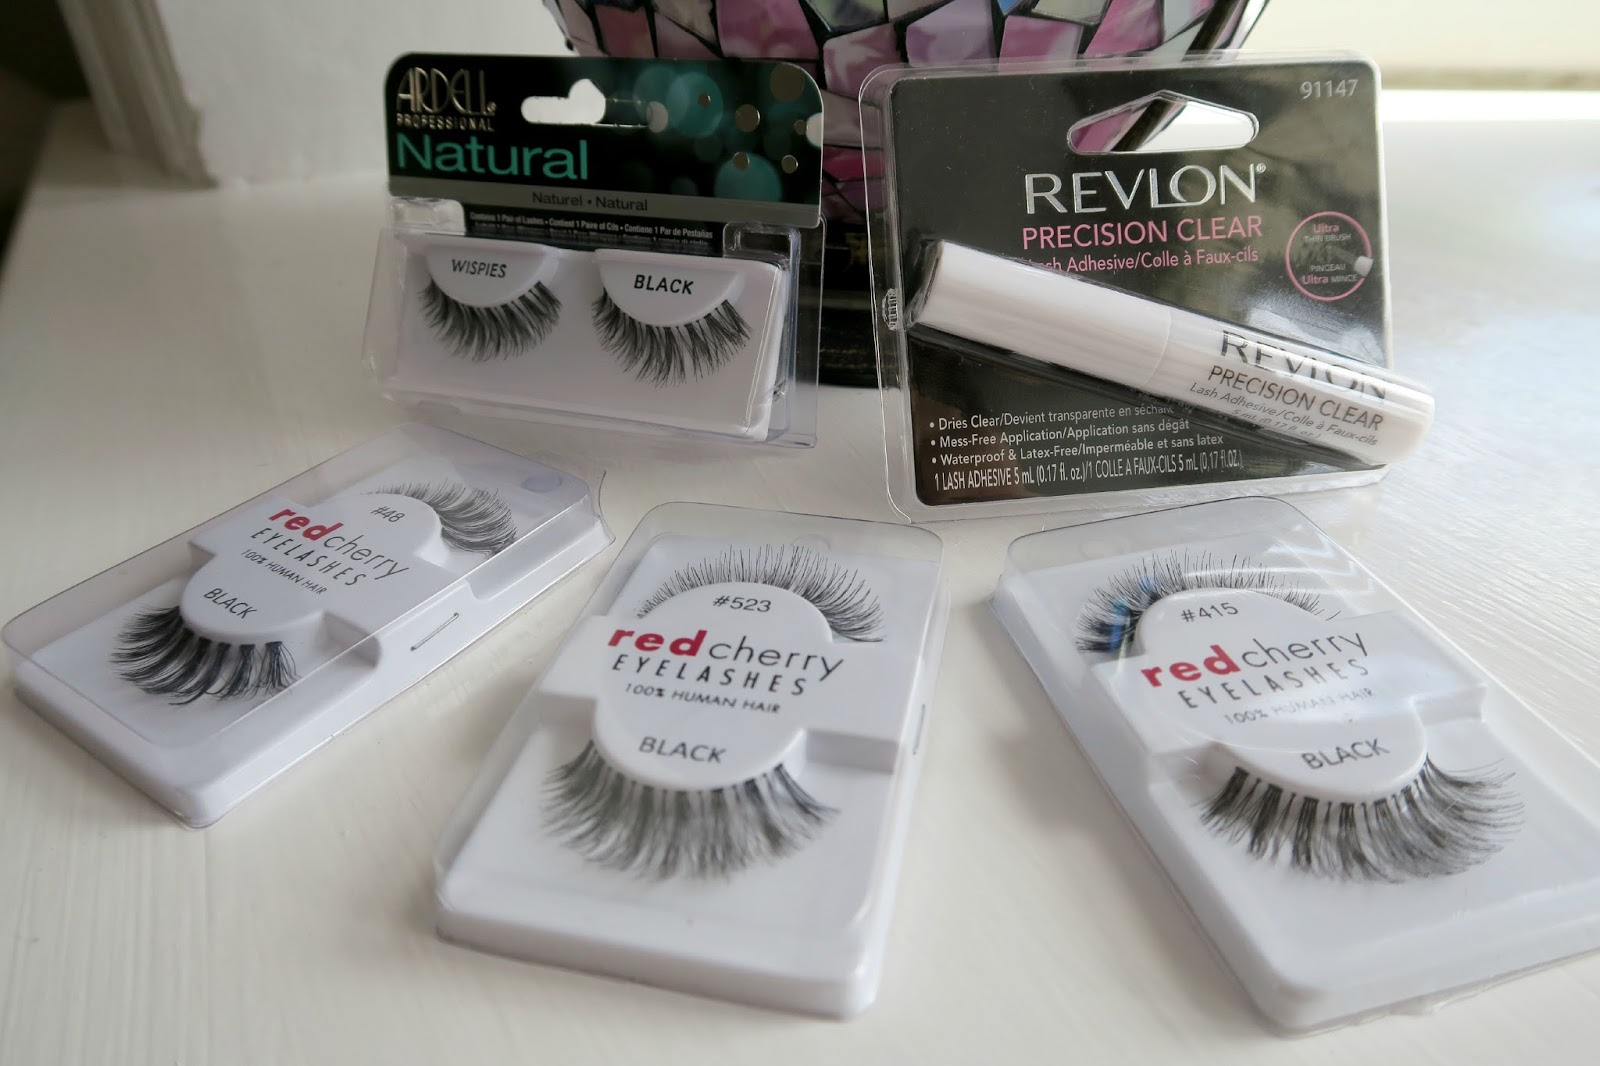 Lash Haul And Revlon Precision Clear Lash Glue Review Alboe By J